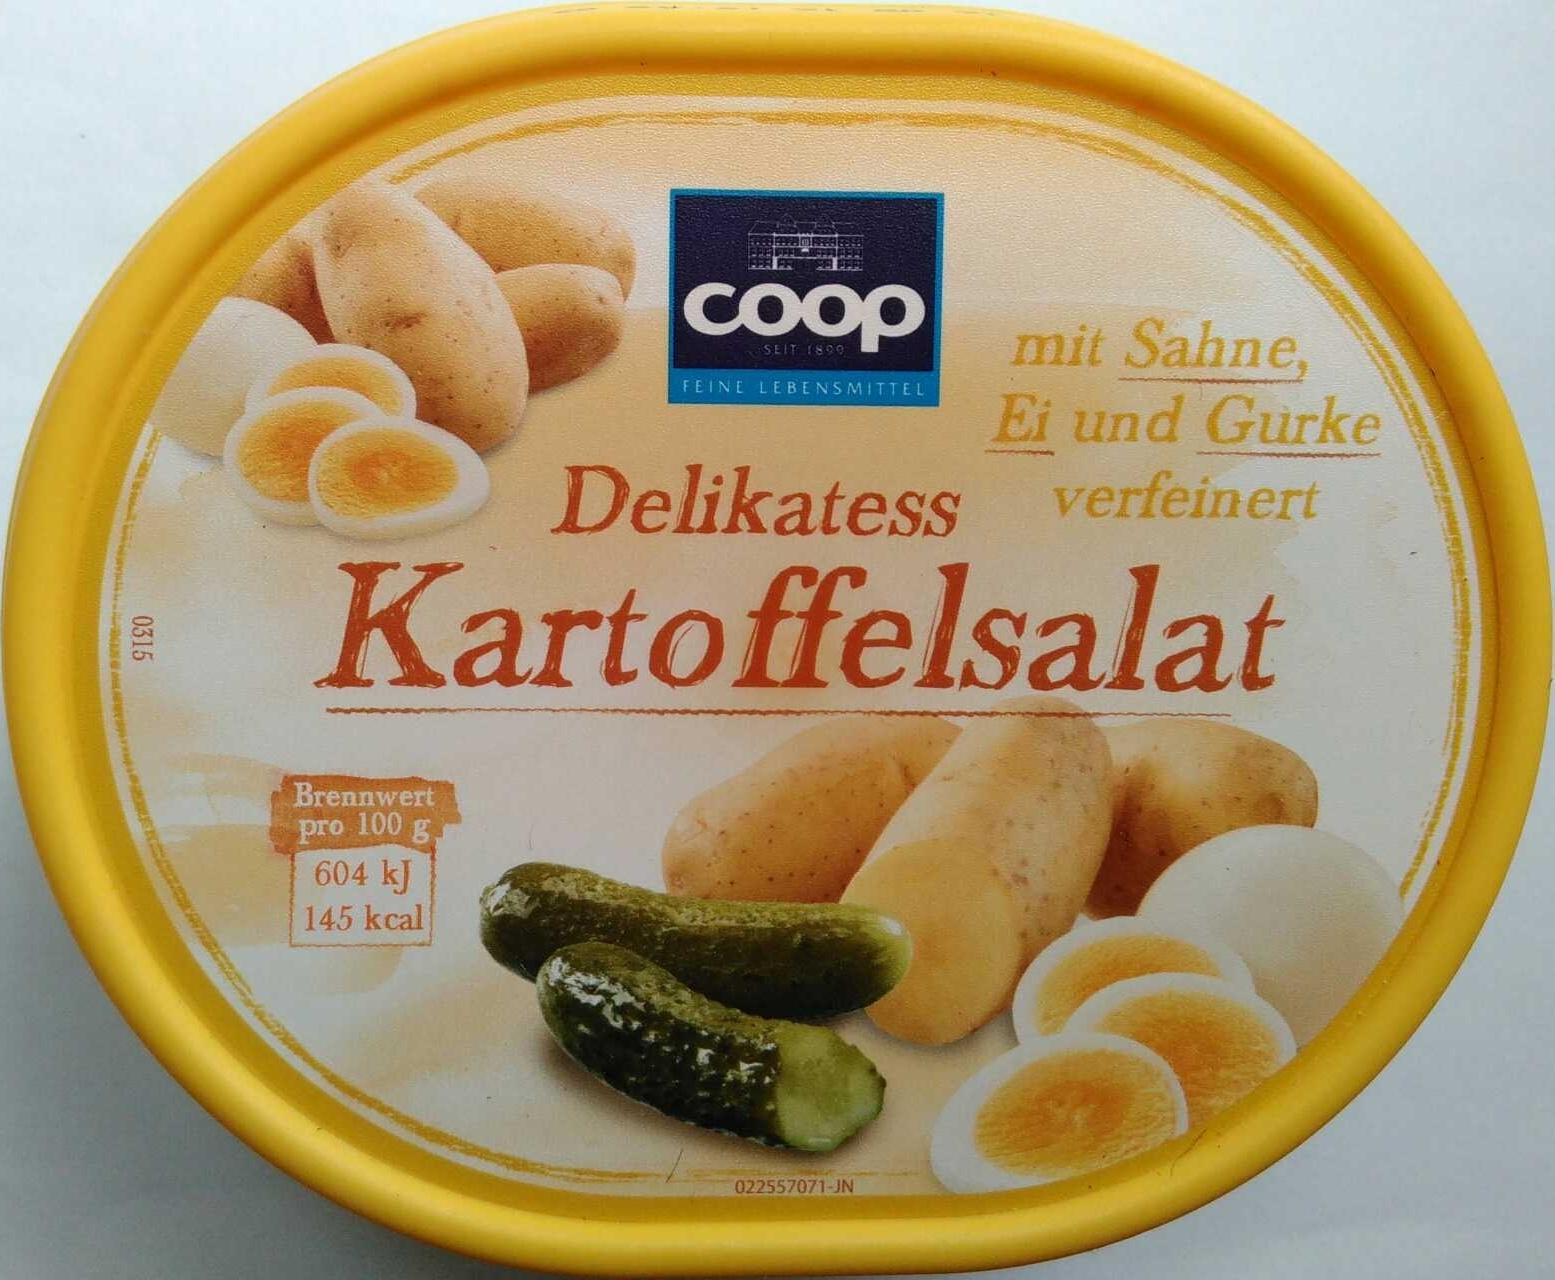 Delikatess Kartoffelsalat - Produit - de